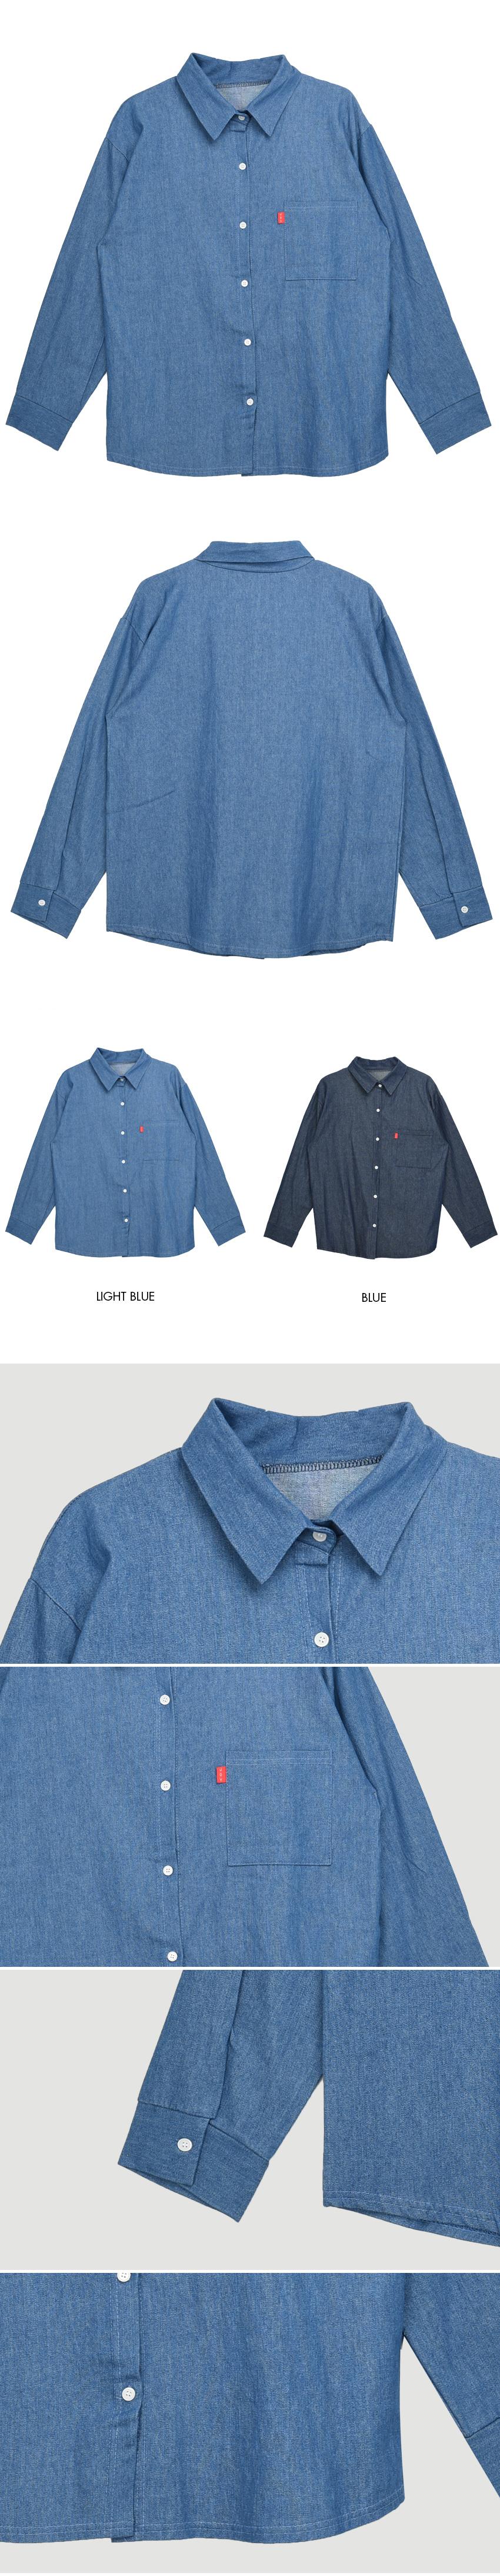 Simple denim cotton shirt